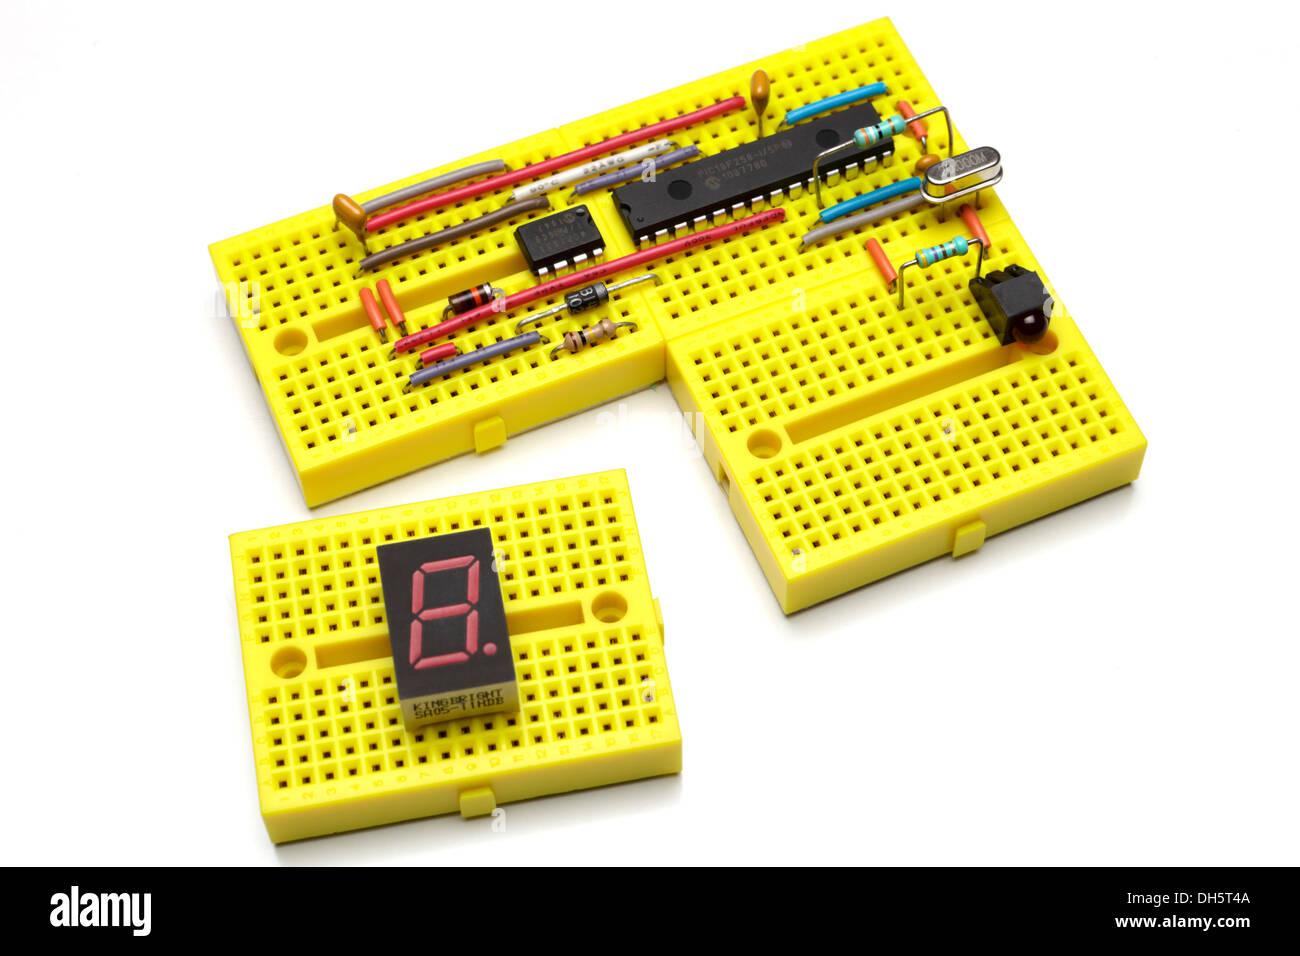 breadboard prototype circuit stock photos \u0026 breadboard prototypeprototype electronic circuit on modular mini breadboards stock image